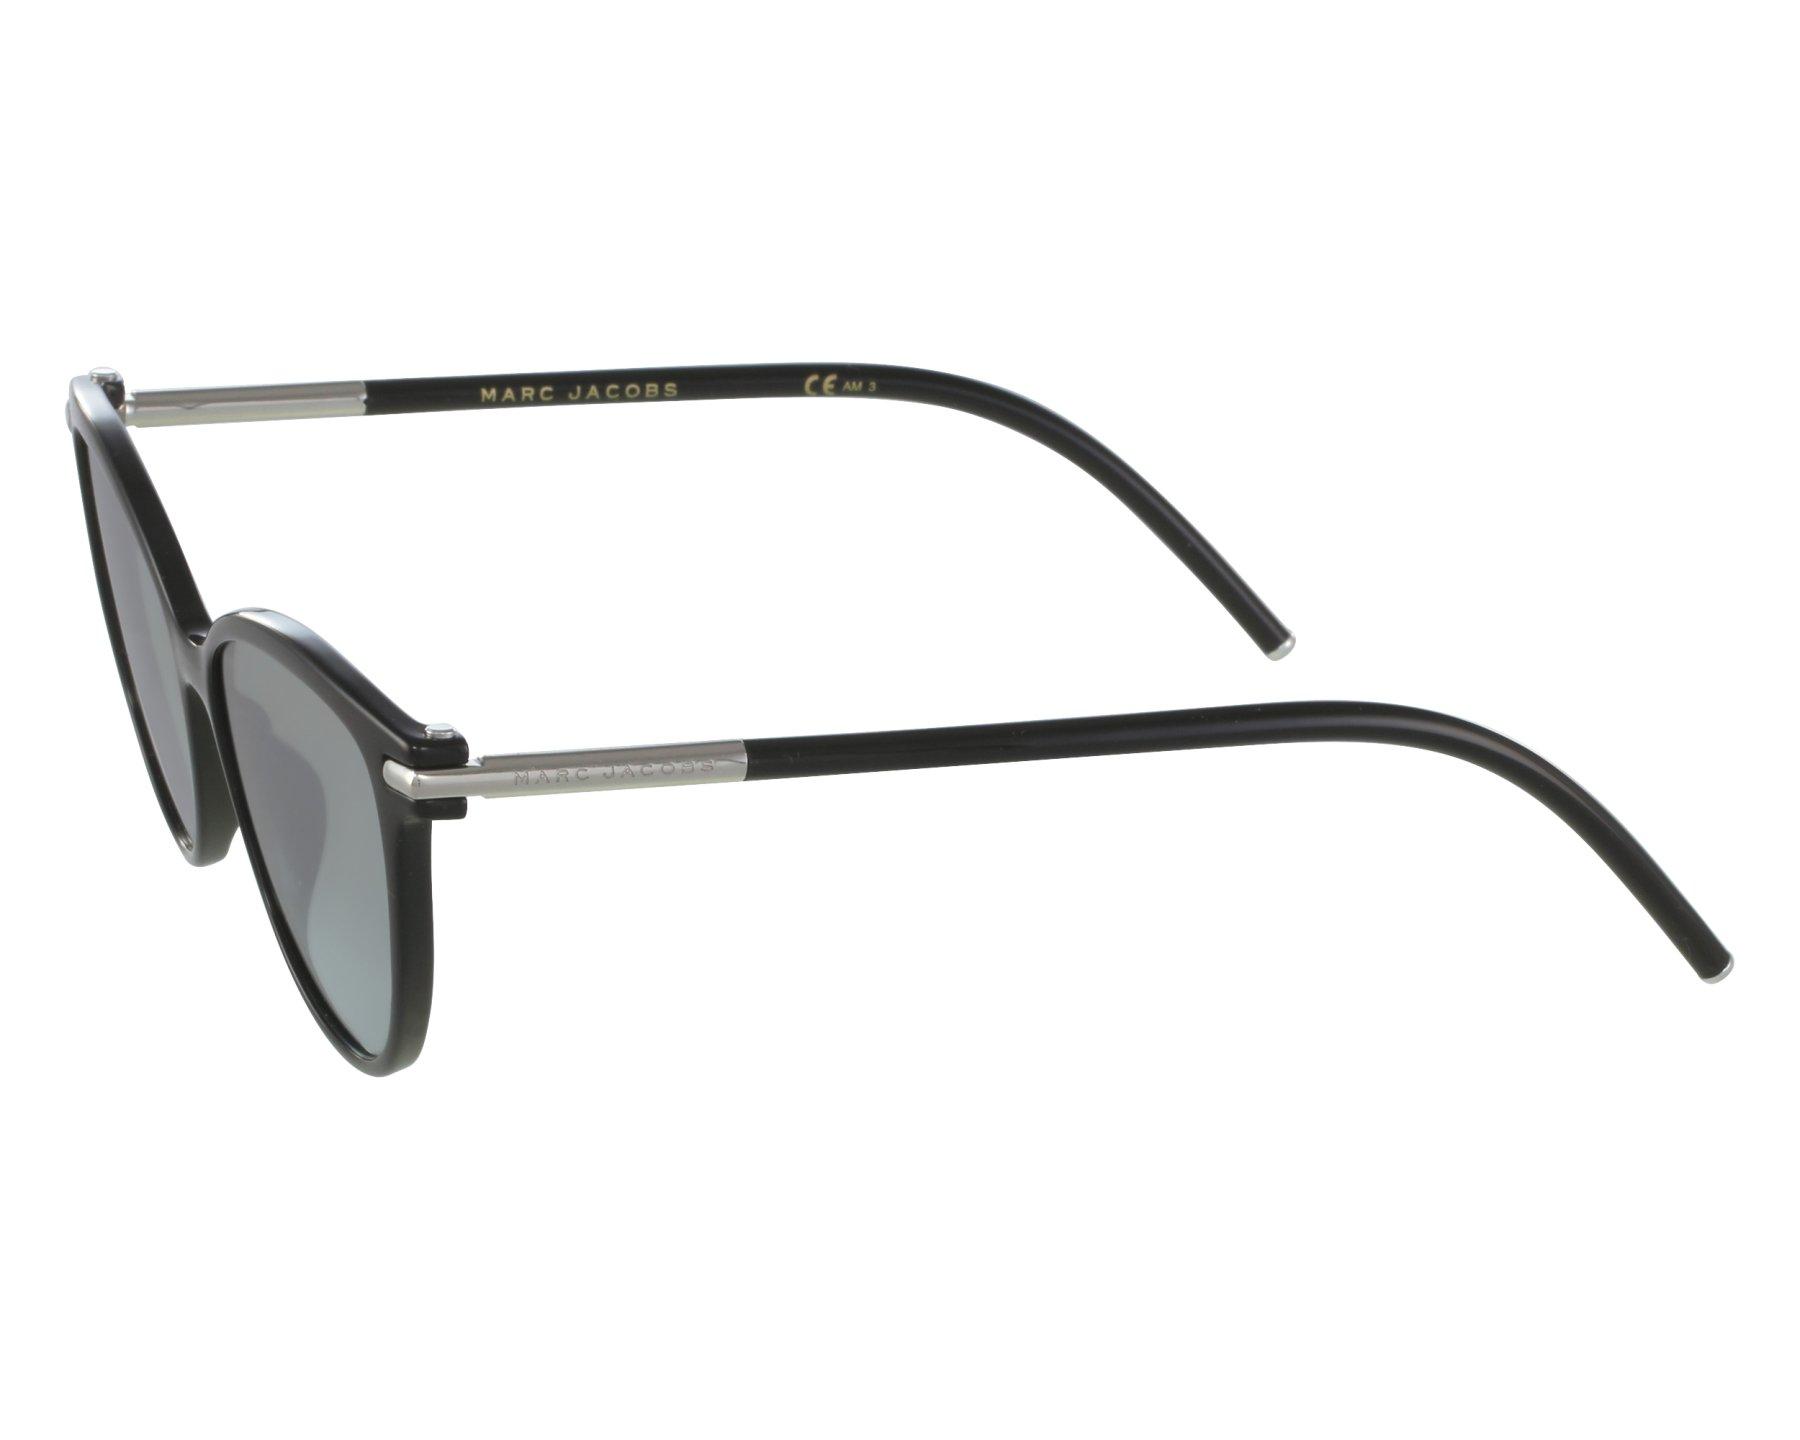 fae4df7c731a thumbnail Sunglasses Marc Jacobs MARC-47-S D28 GY - Black front view